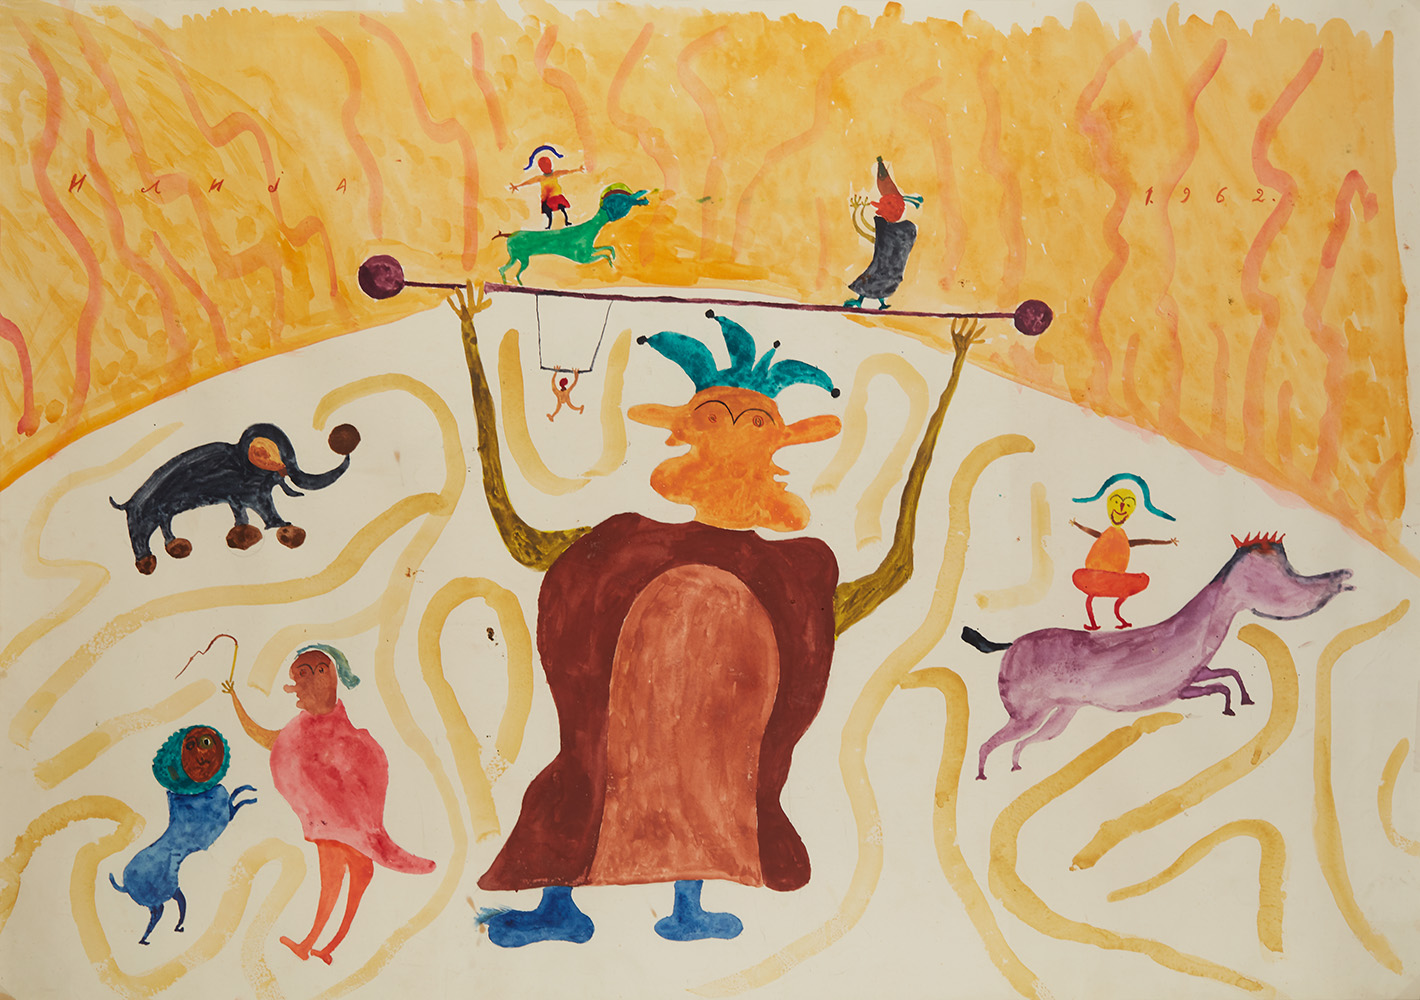 Ilija Bosilj Bašičević    The Fairies' Circus  , 1962 Gouache on paper 29.125 x 42.125 inches 74 x 107 cm IBo 4